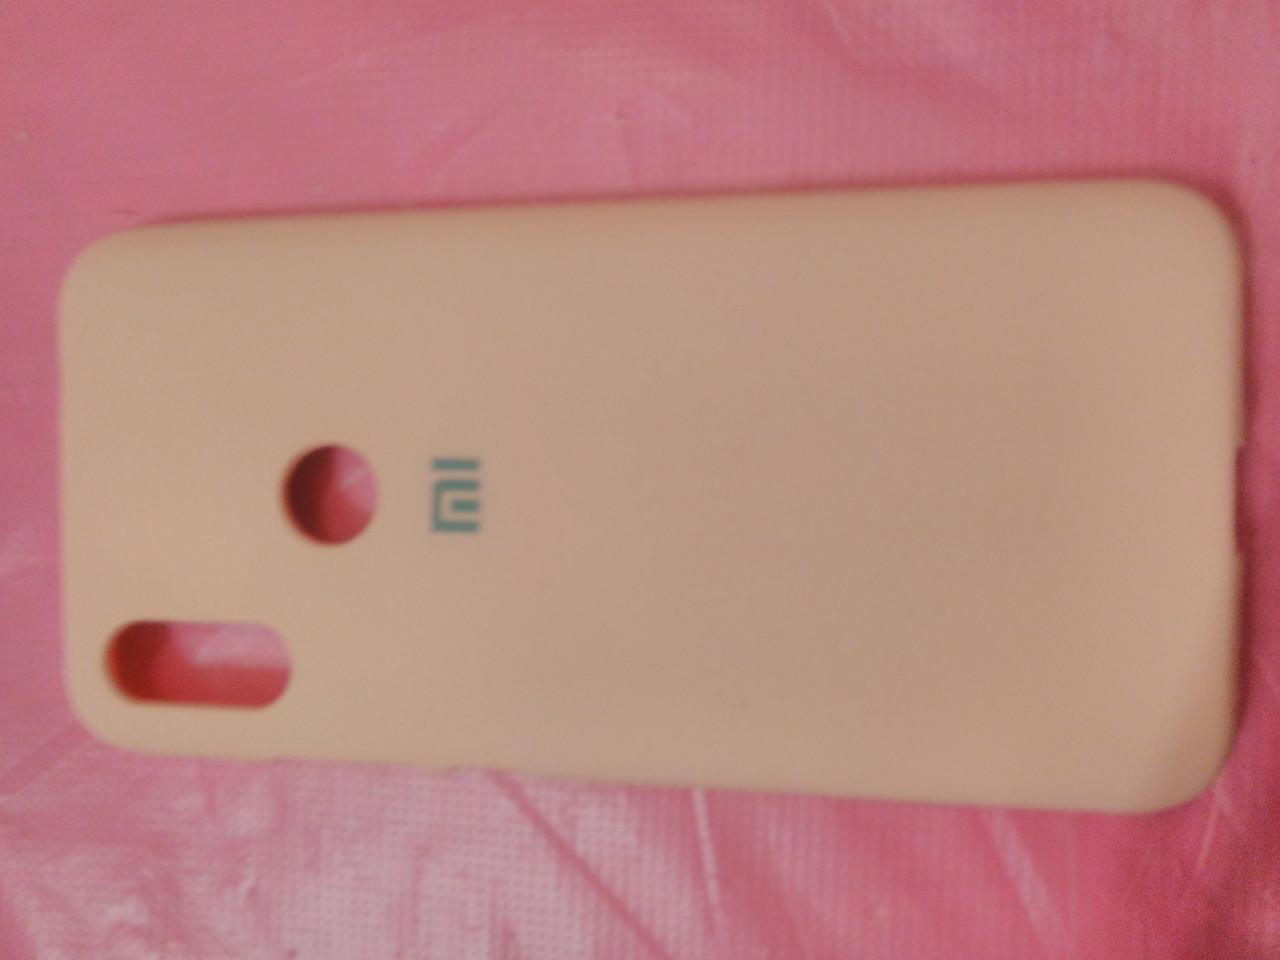 Накладка   Silicon Cover full   для  Xiaomi Redmi 7  (розовый)